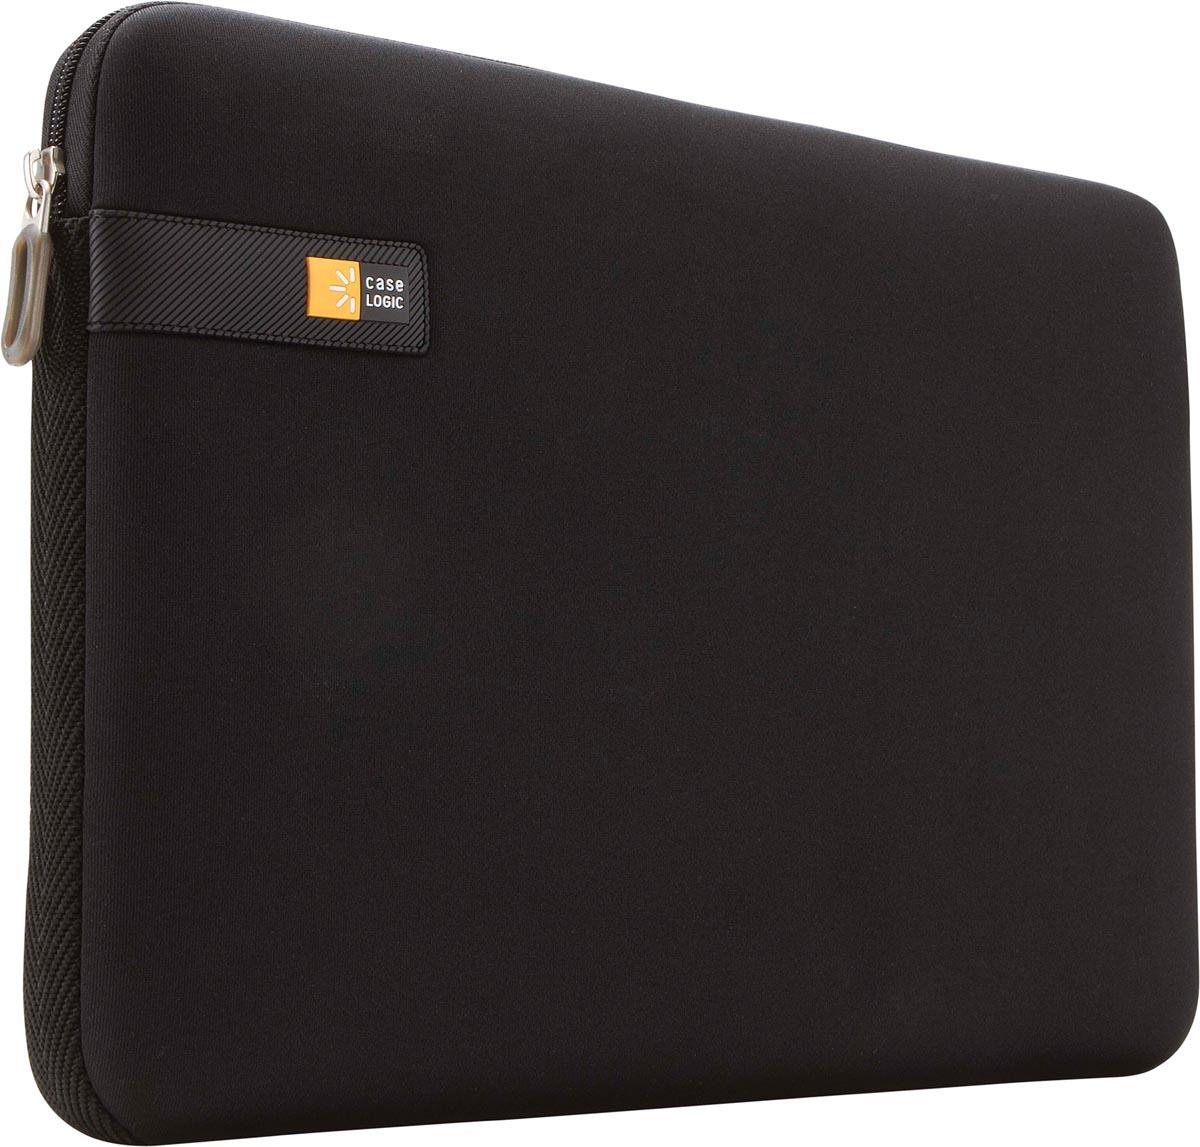 Case Logic sleeve LAPS-116 voor 16 inch laptops